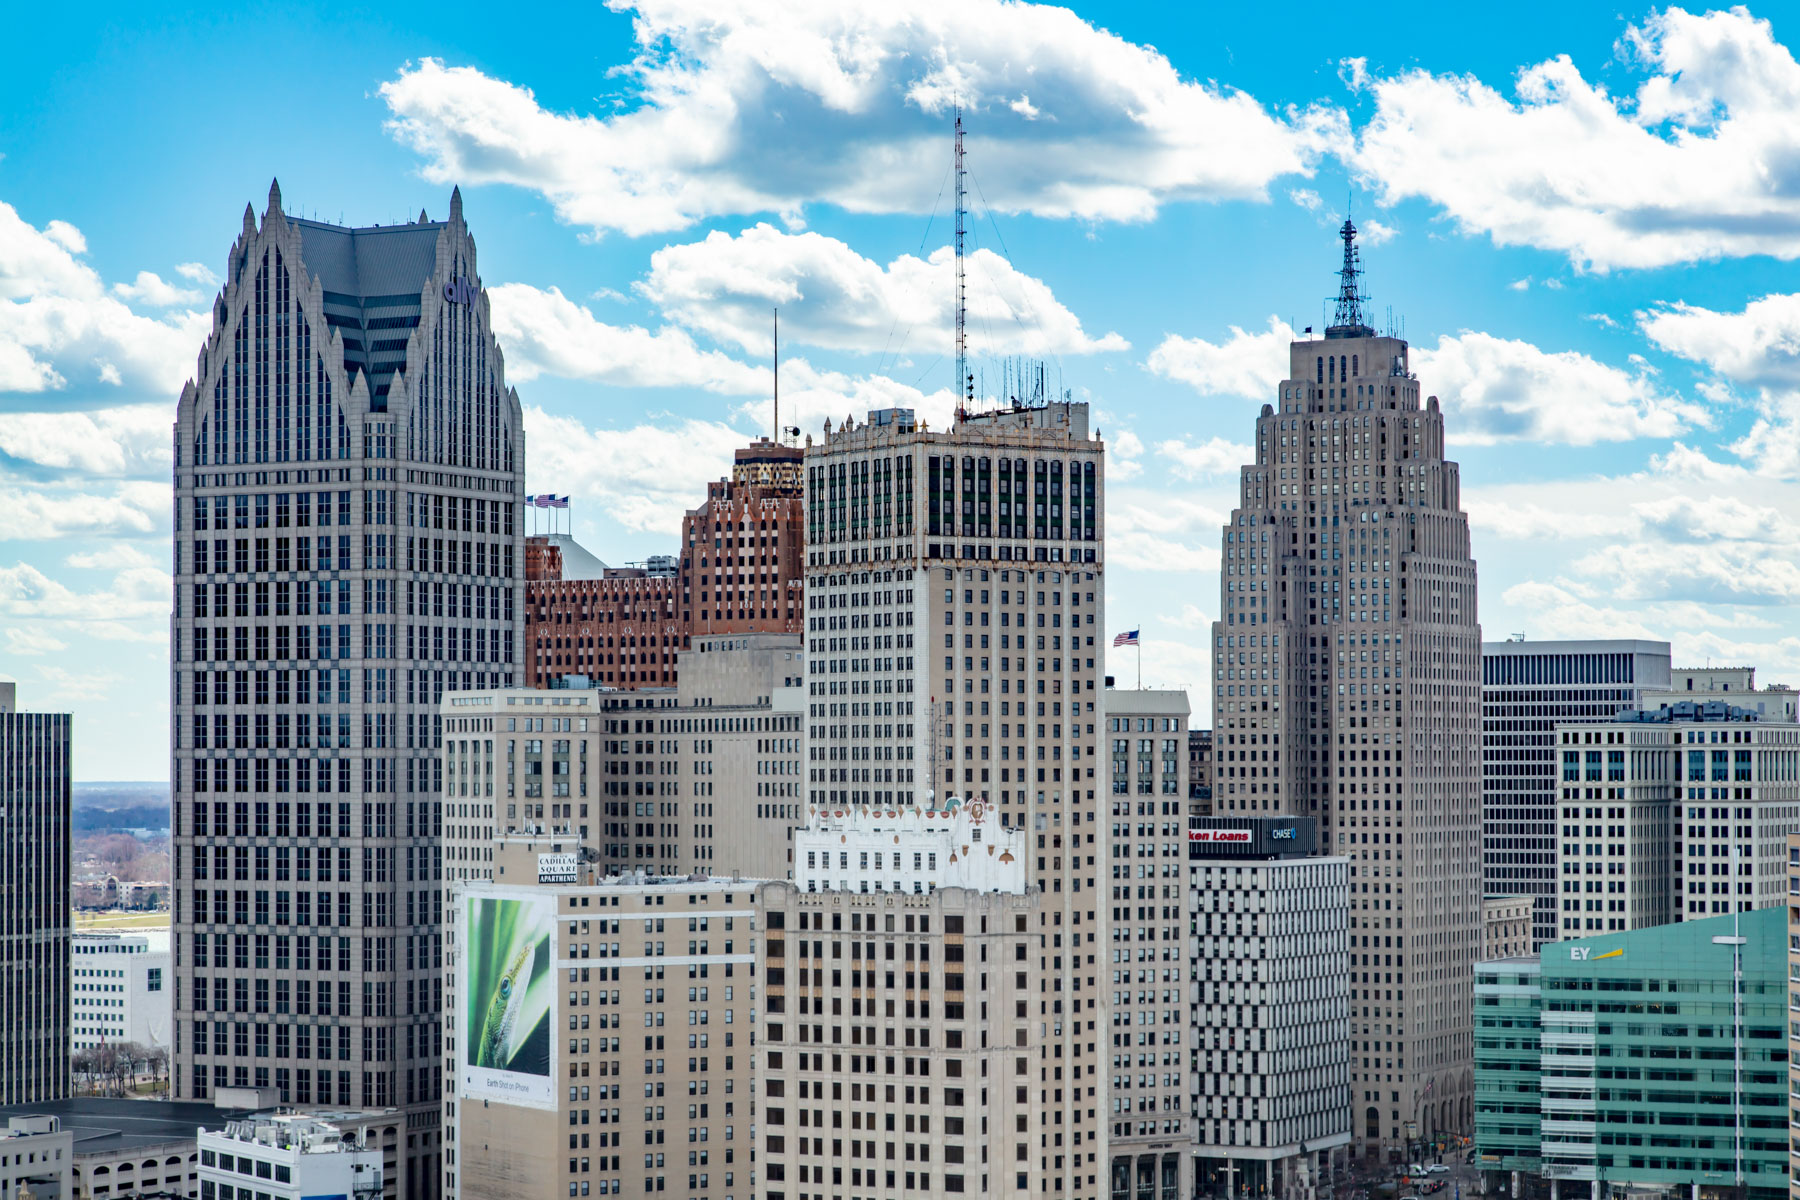 City pics GtCH Rooftop - 1z3a7254